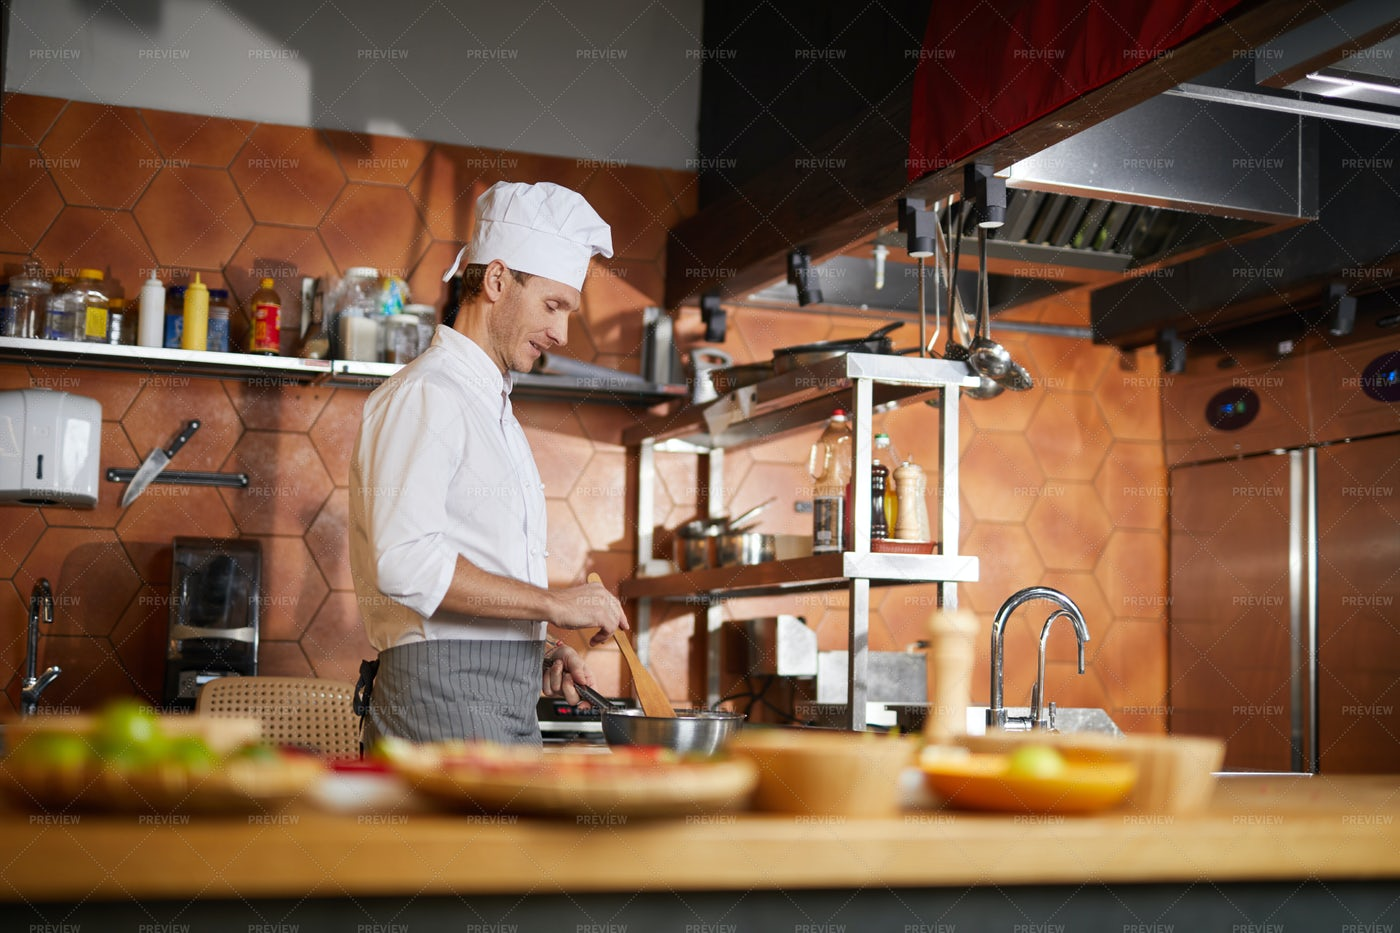 Chef Cooking In Restaurant Kitchen: Stock Photos